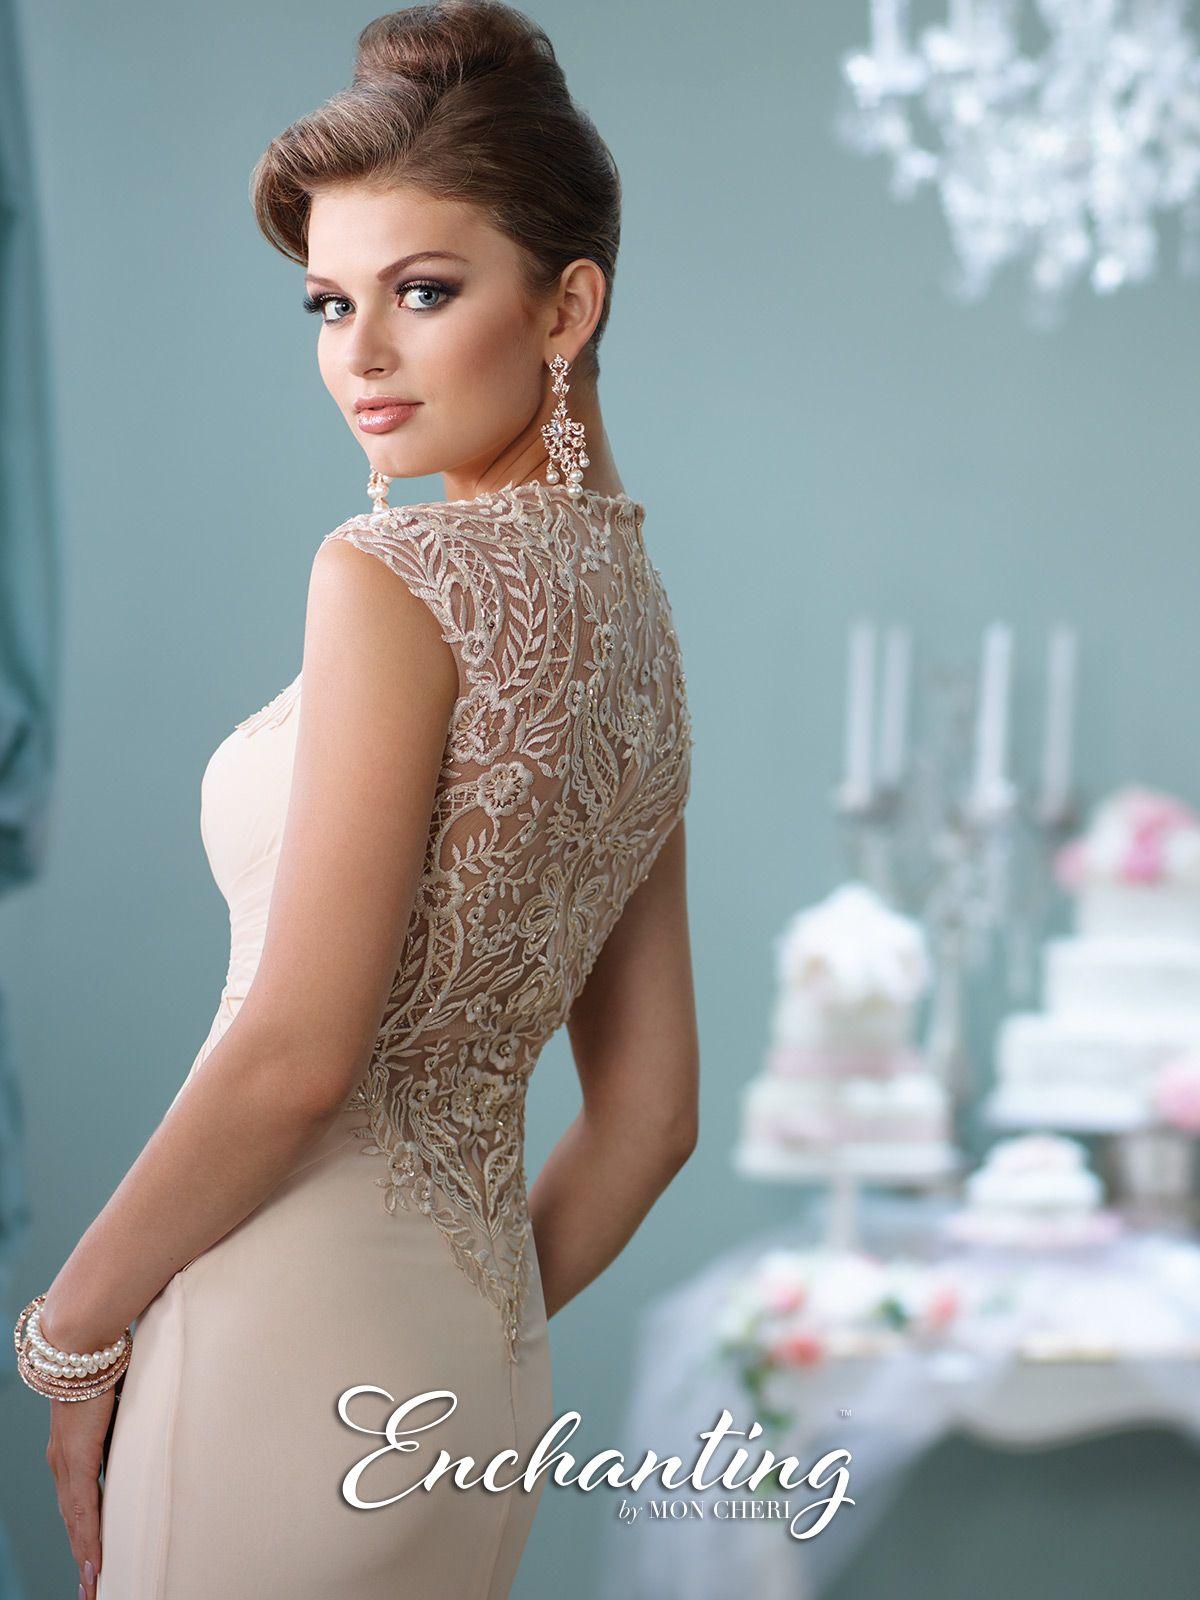 Modern Wedding Dresses 2018 by Mon Cheri   Wedding dress ...